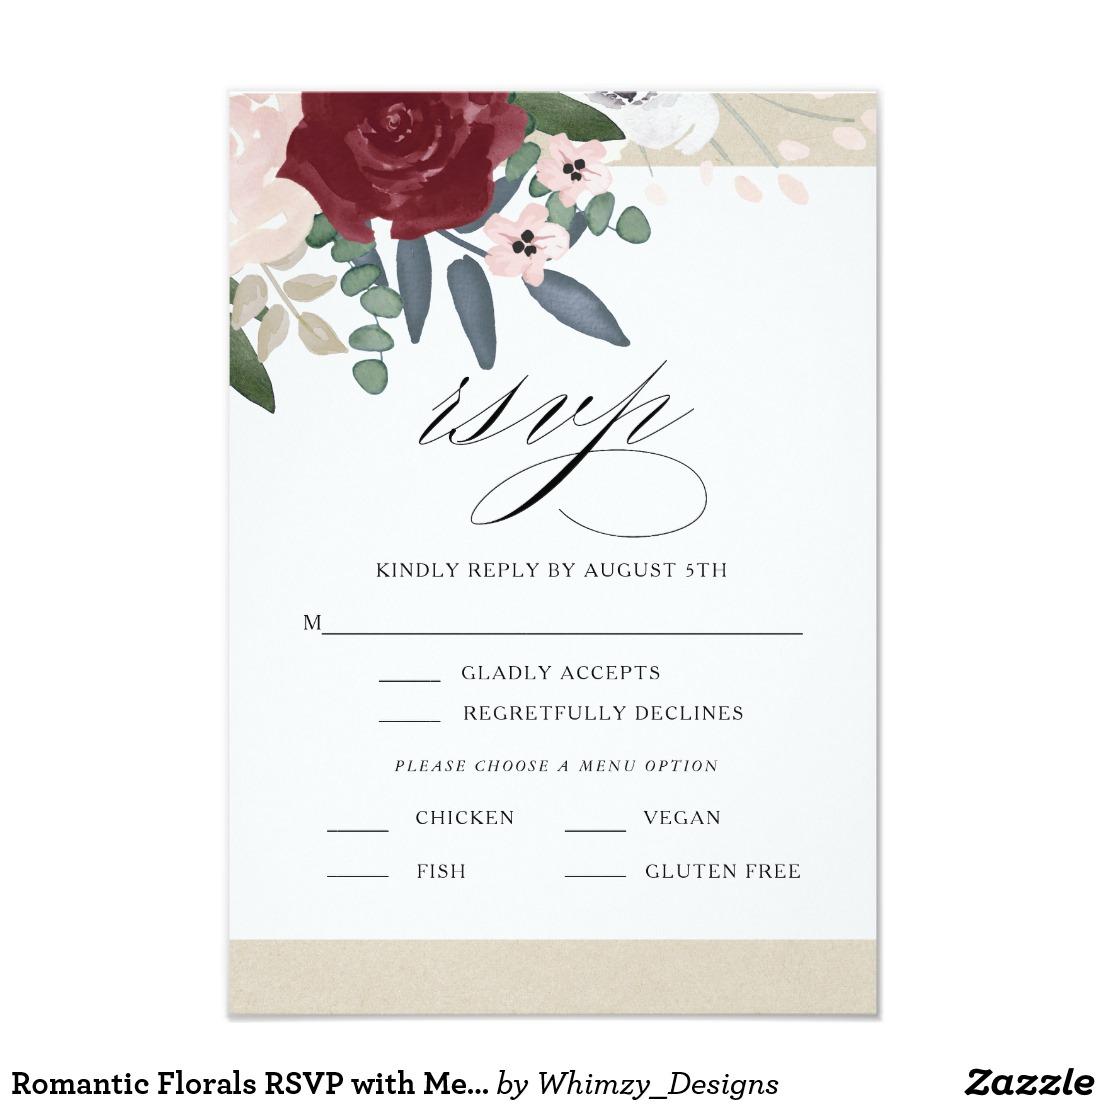 romantic florals wedding menu example